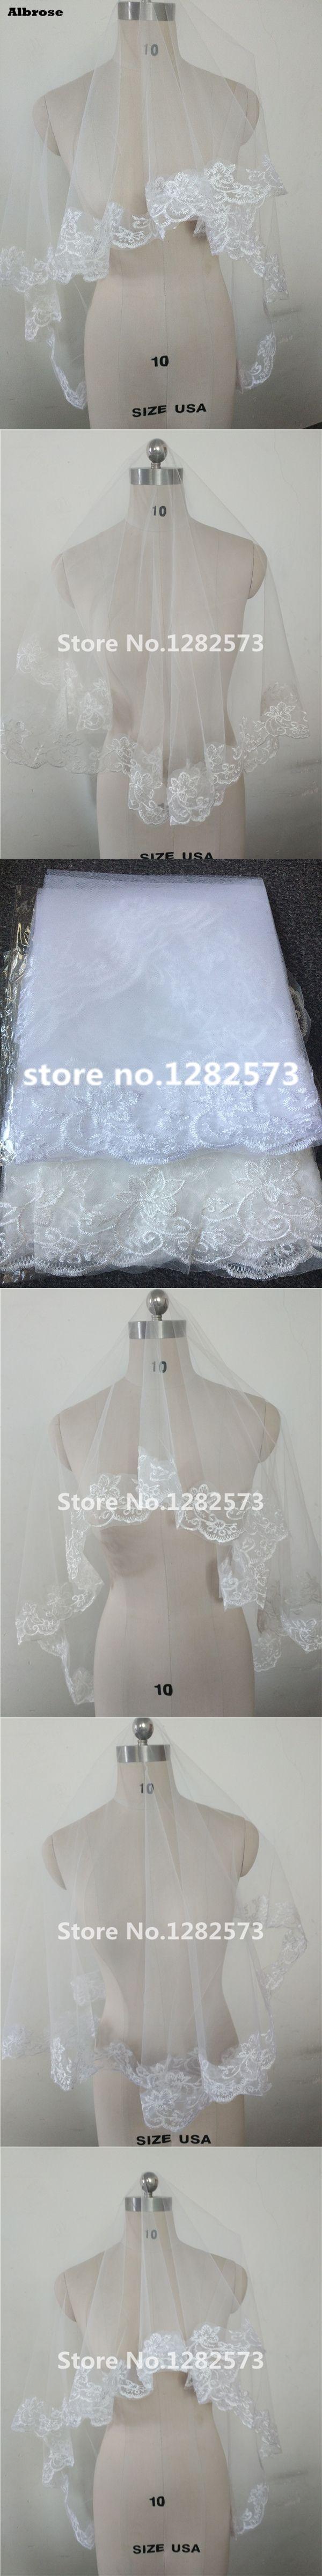 Cheap Lace Edge Short Wedding Veil White Ivory Bridal Veil voile mariage Wedding Veils Made in China High Quality velos de novia